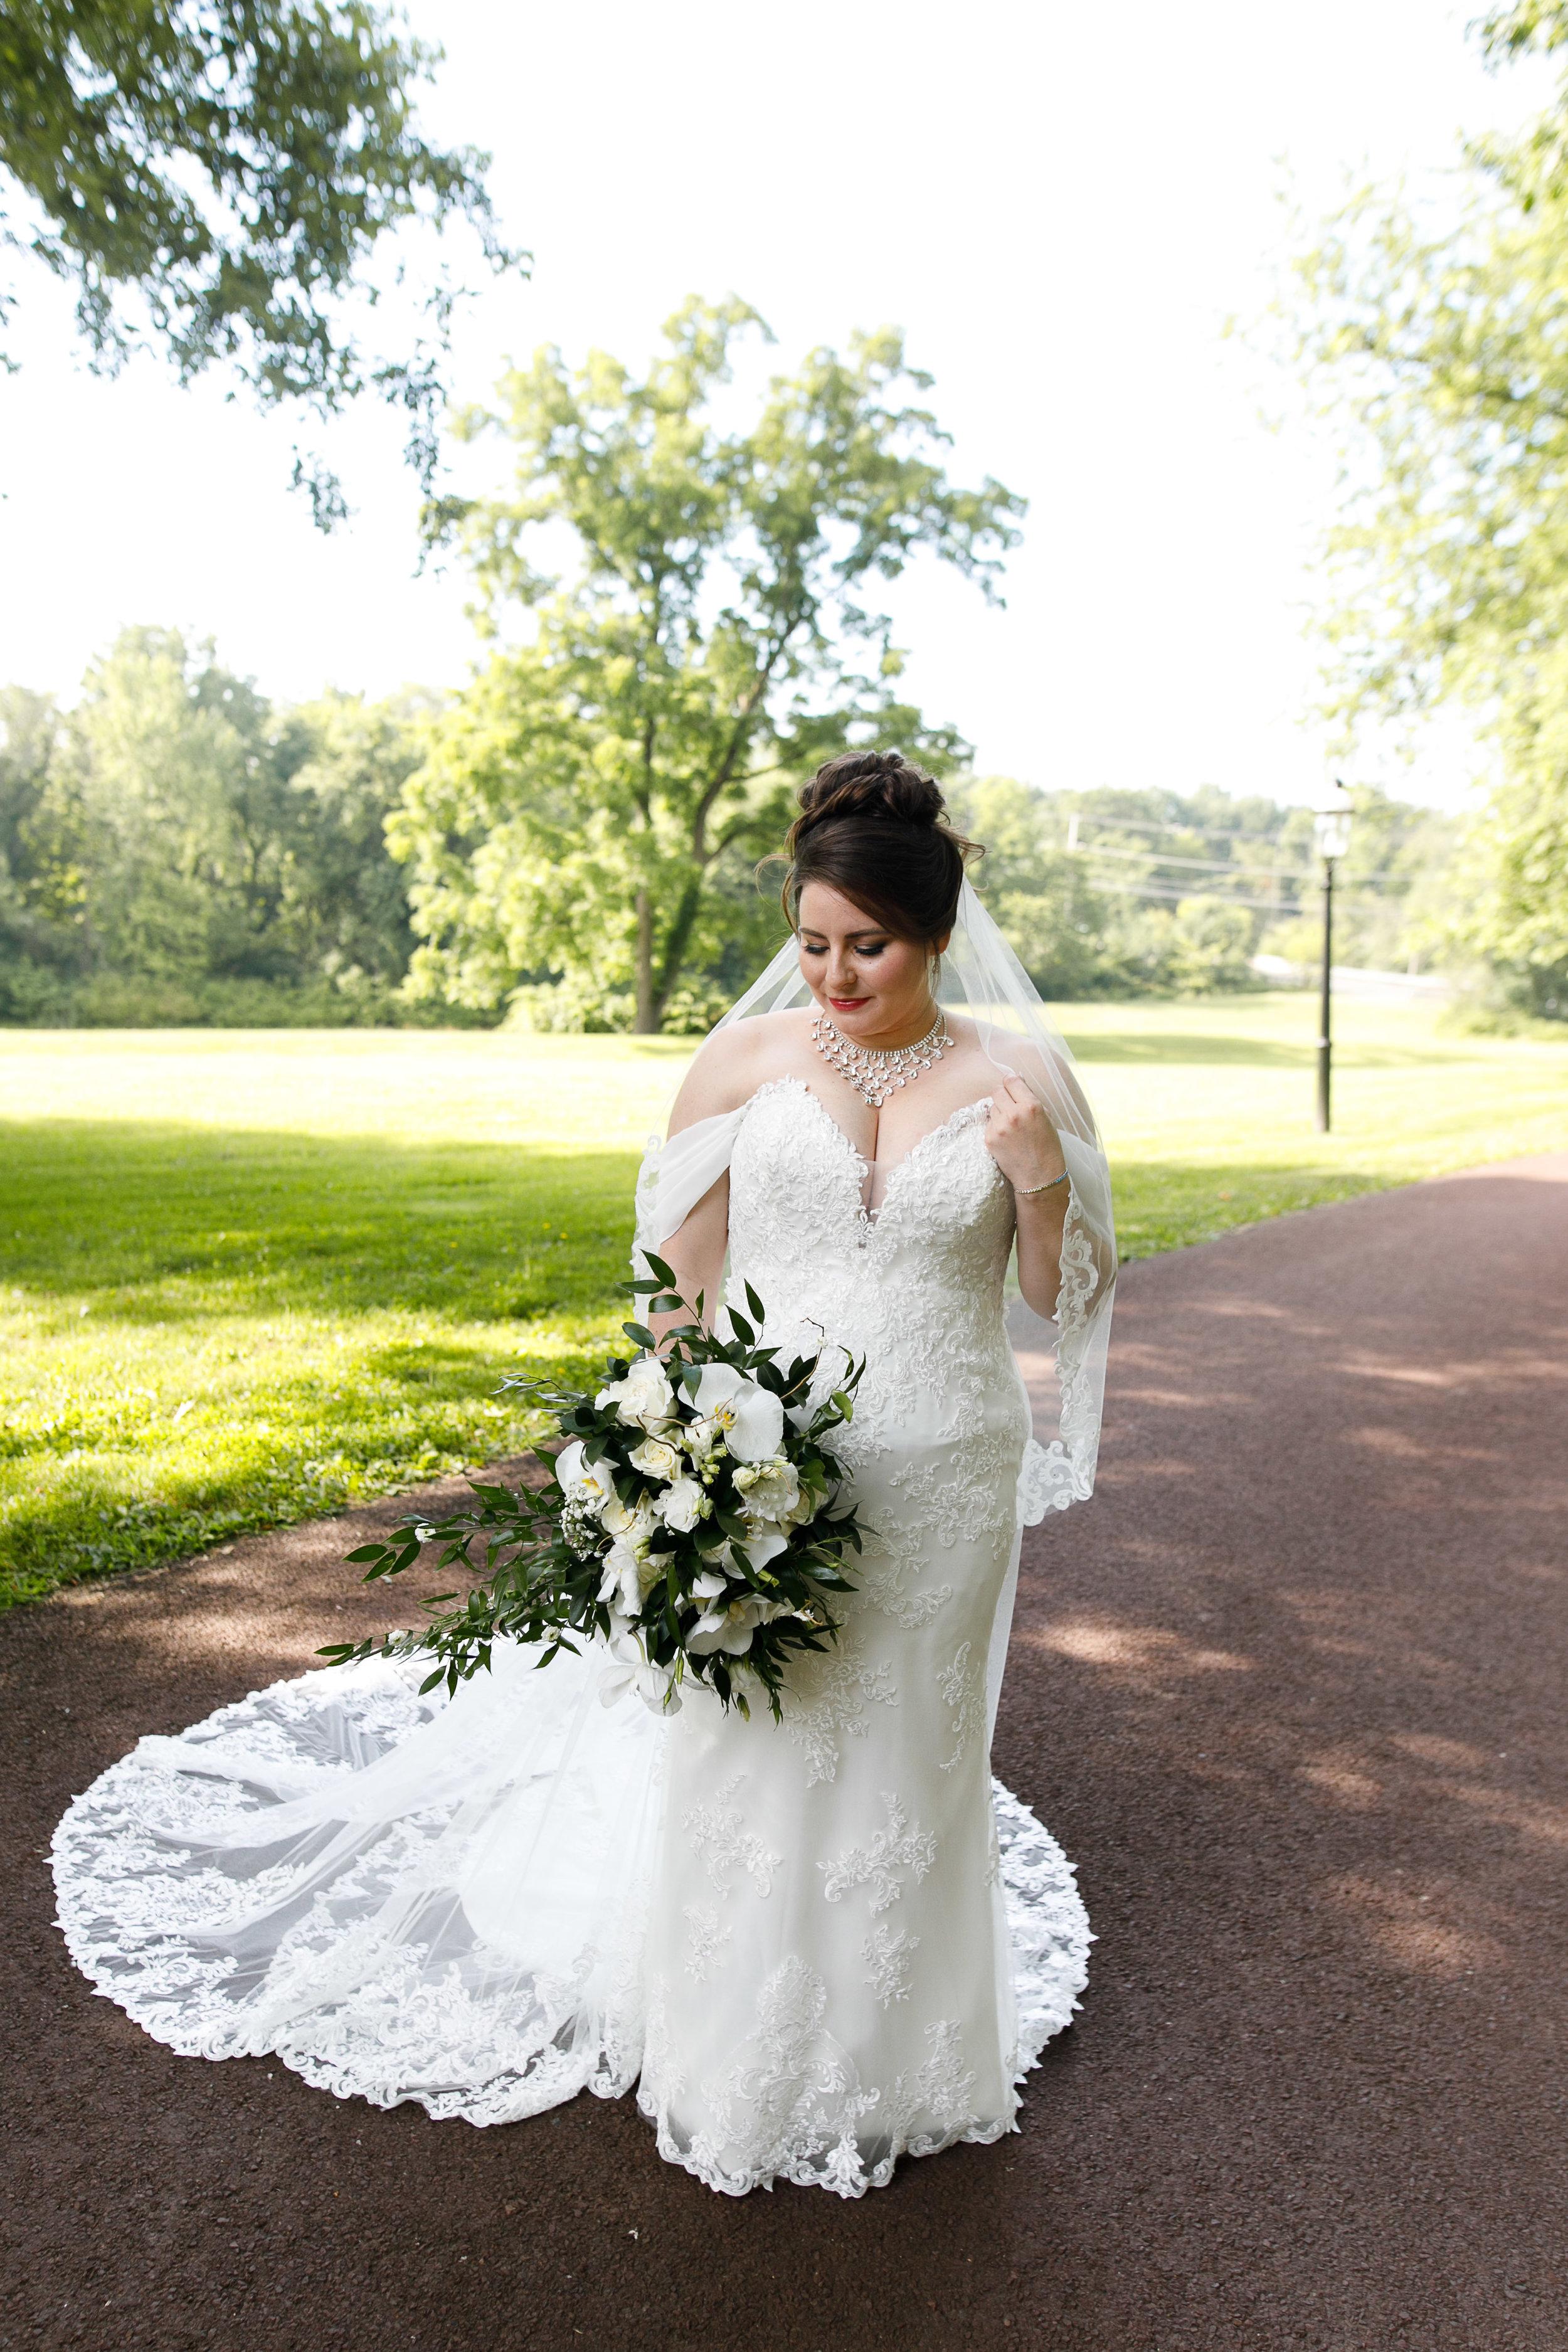 Wedding at Joseph Ambler In Bucks County PA4.jpg